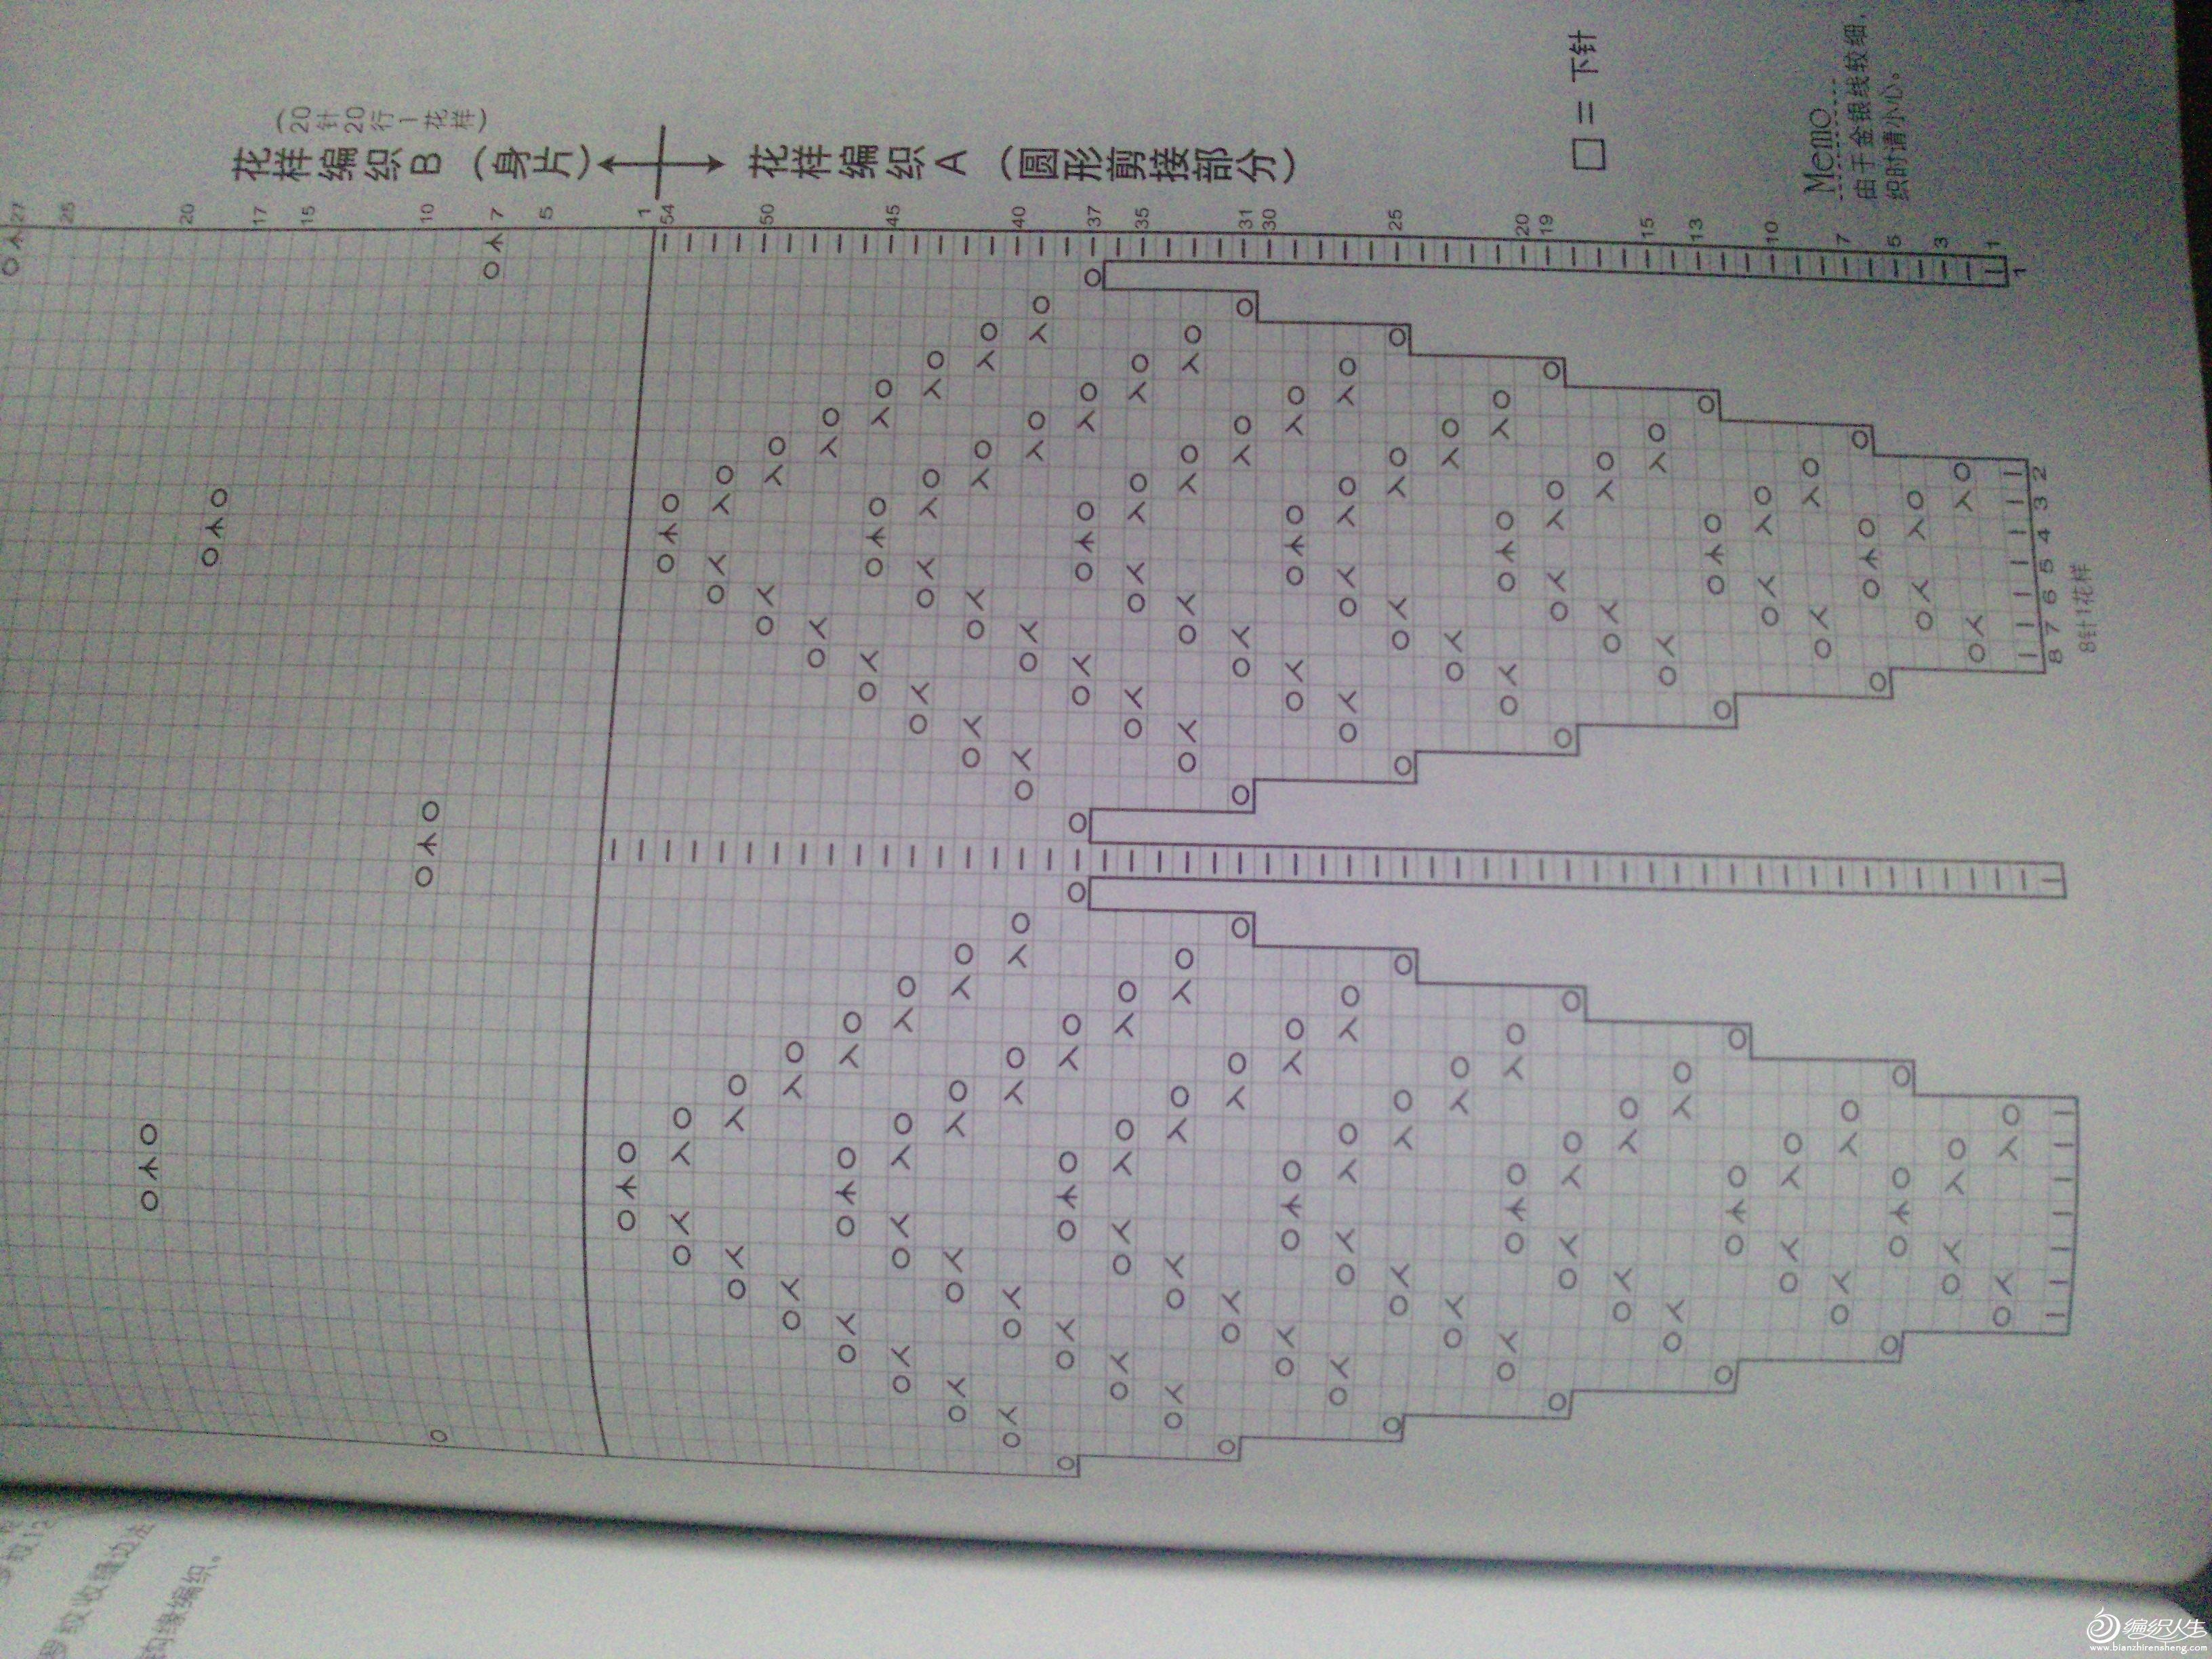 P1245[01]_14-12-12.jpg